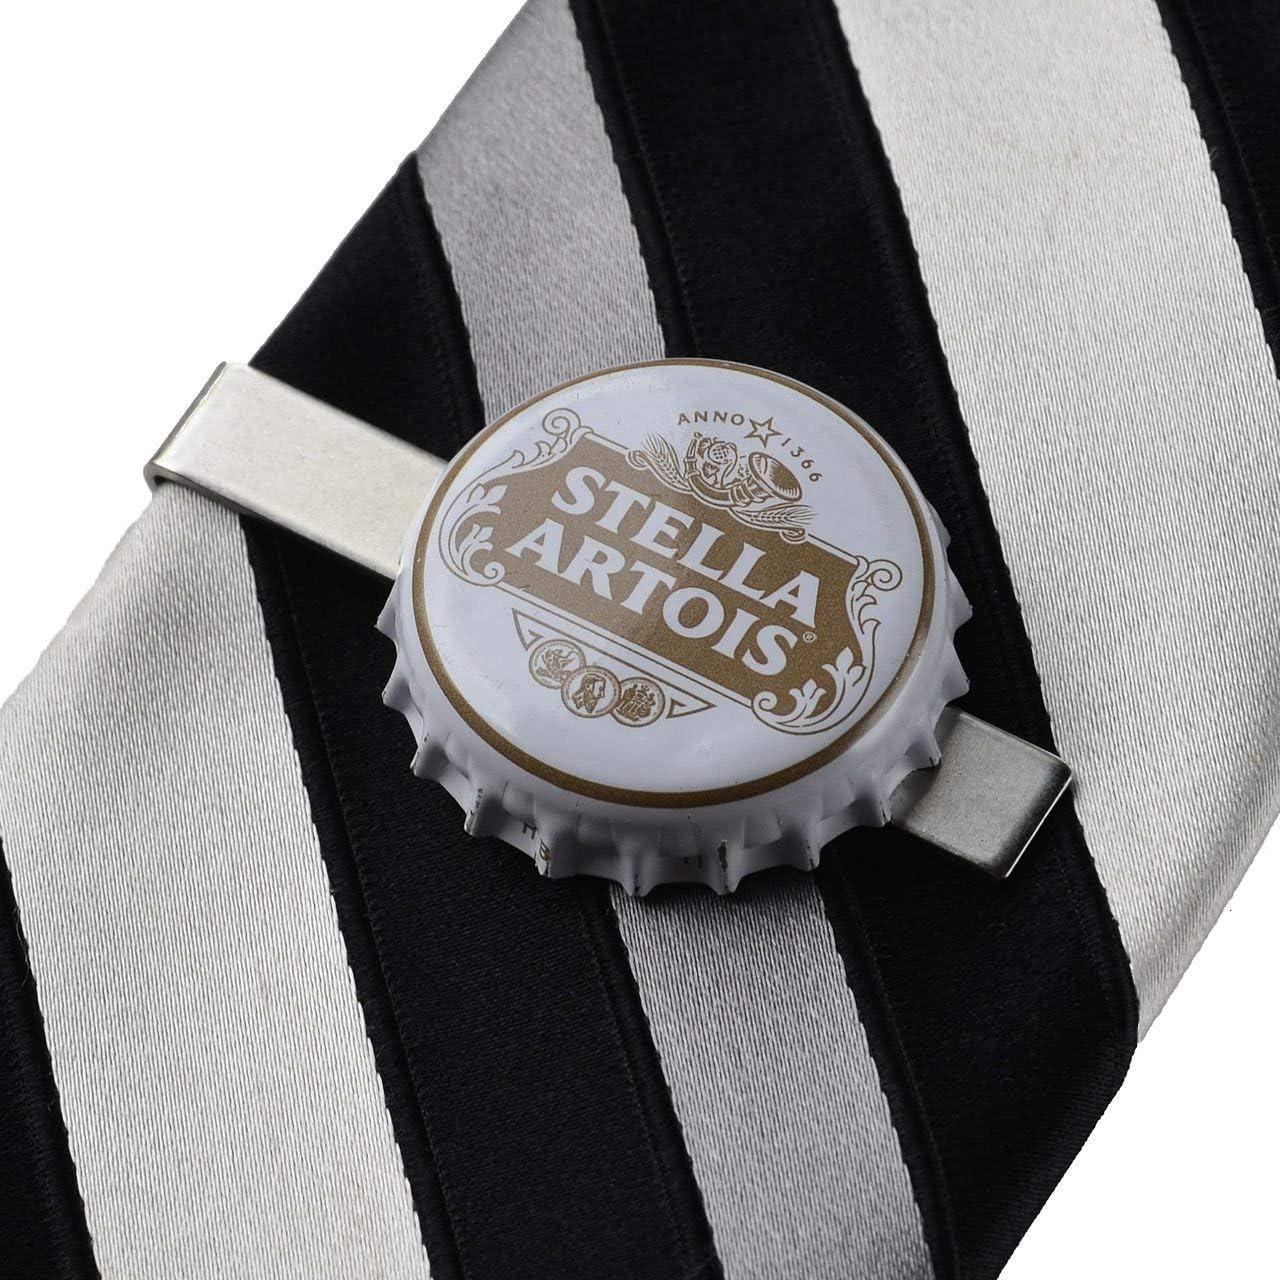 Quality Handcrafts Guaranteed Stella Artois Bottle Cap Tie Clip